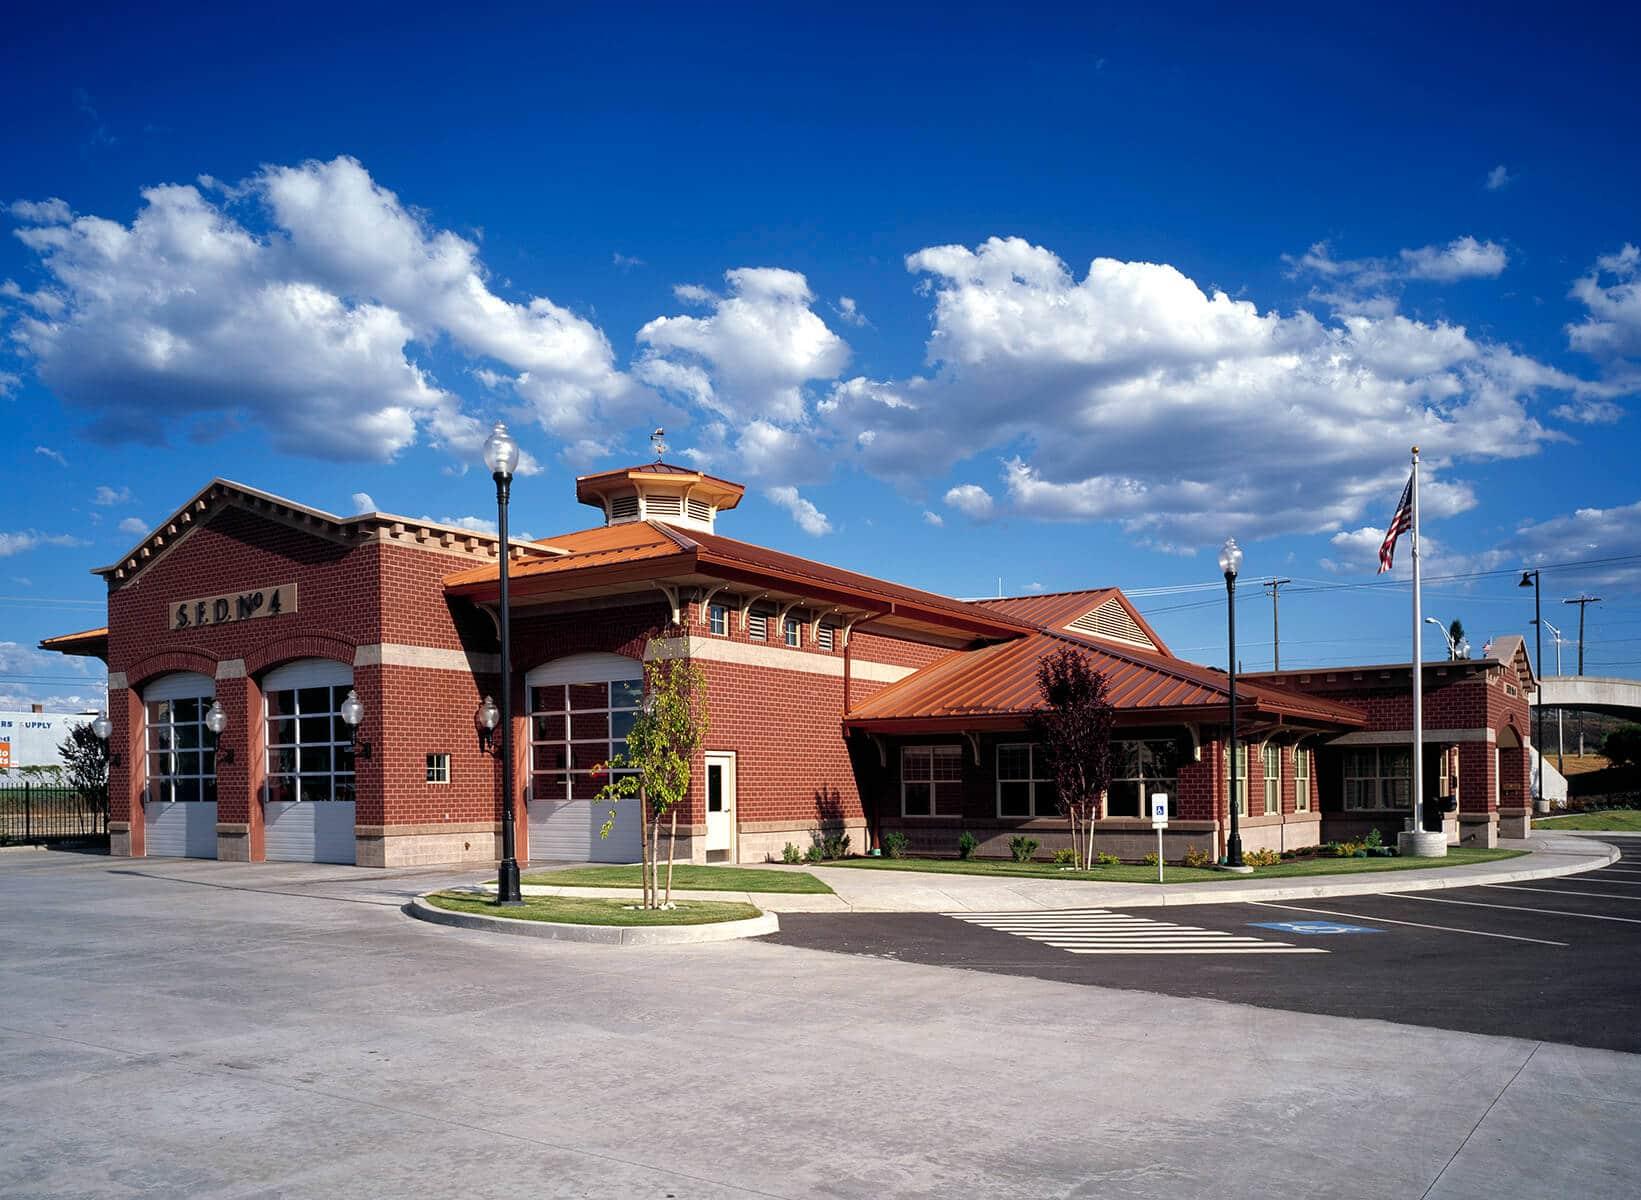 Spokane Fire Station No. 4